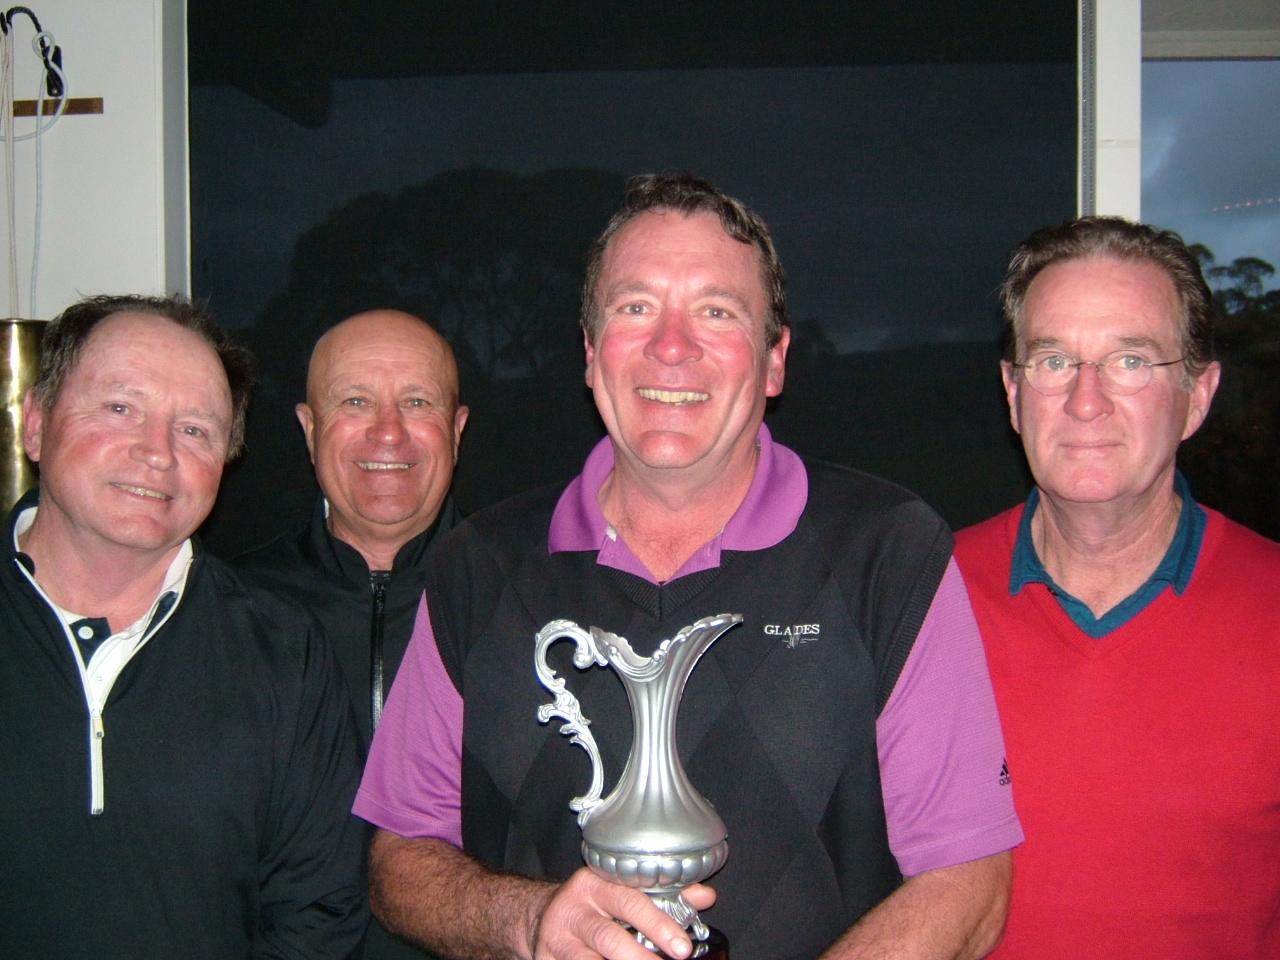 Winners from Victor Motors & Auto Gas (L-R A. TAPP, J. GRIFFEN, L. DRUMMOND, K. TAYLOR).